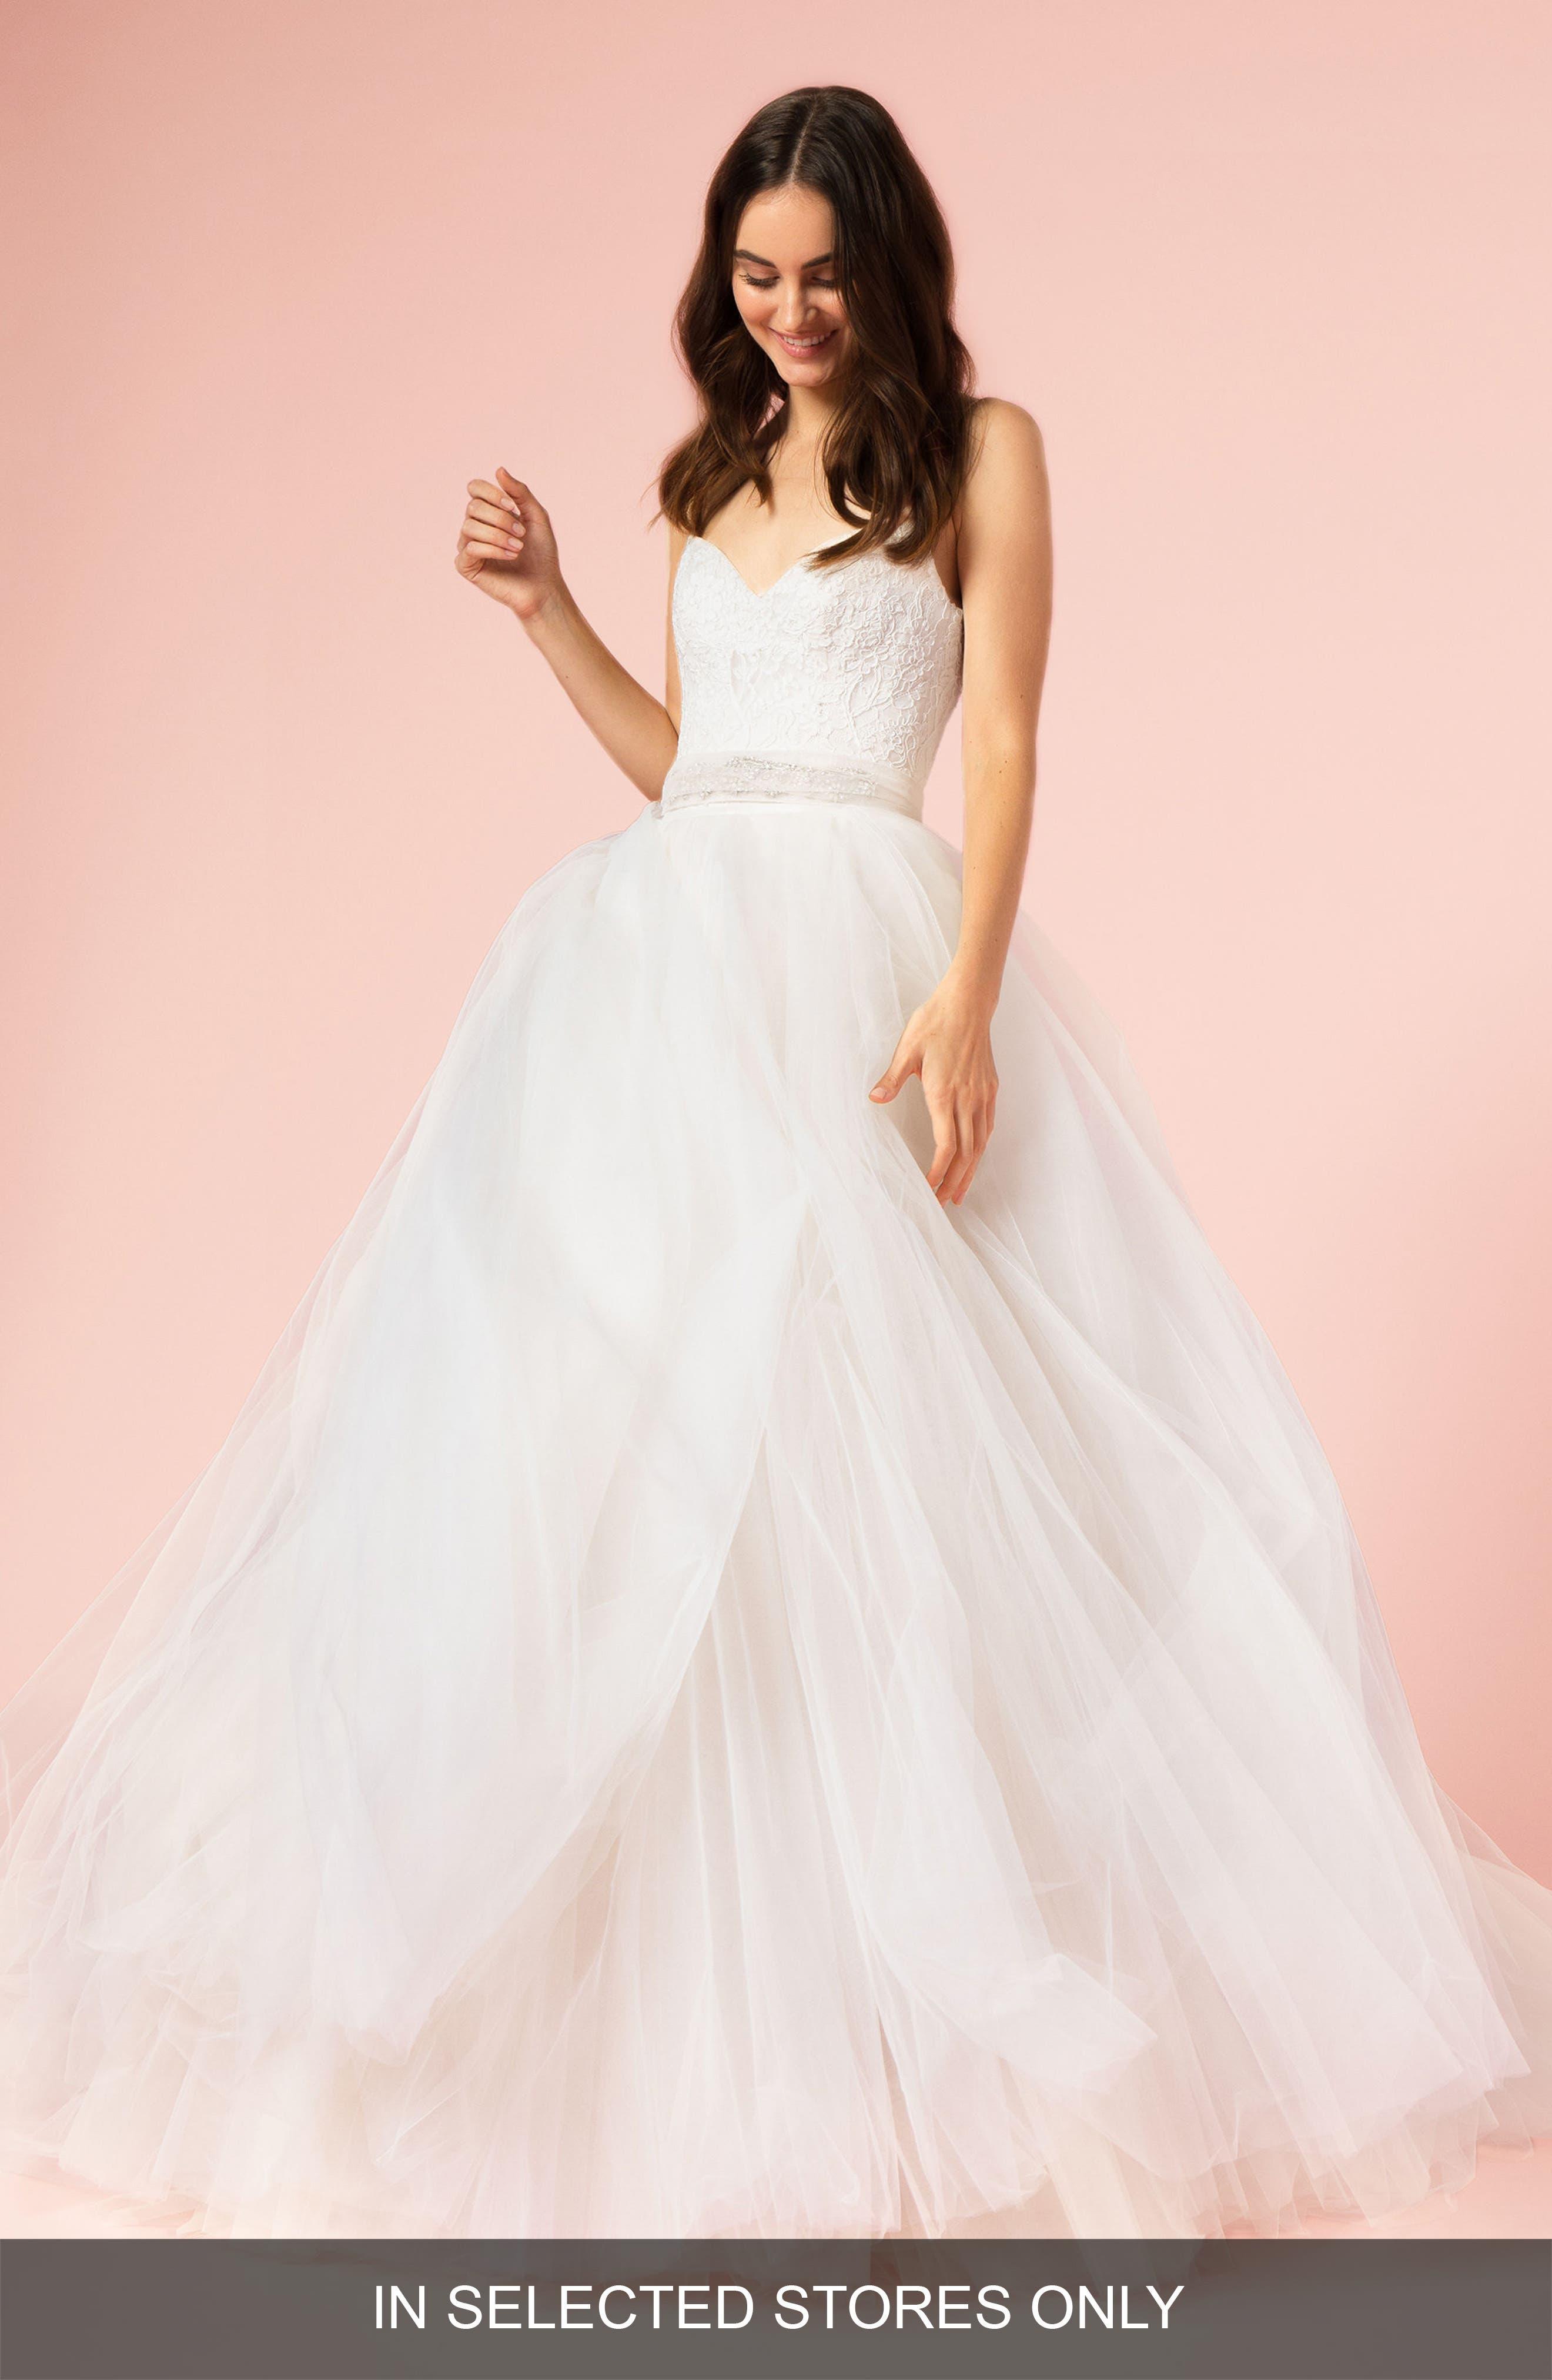 Spaghetti Strap Lace & Tulle Ball Gown,                             Main thumbnail 1, color,                             SILK WHITE/ BLUSH